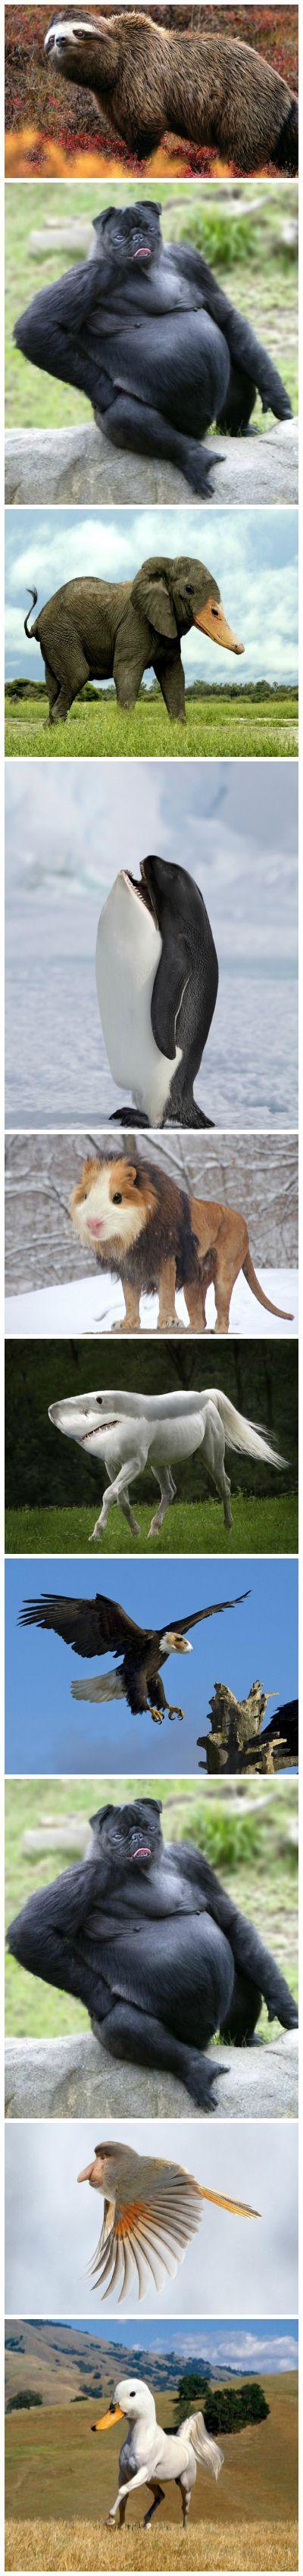 Crazy animal mashups - oh dear haha